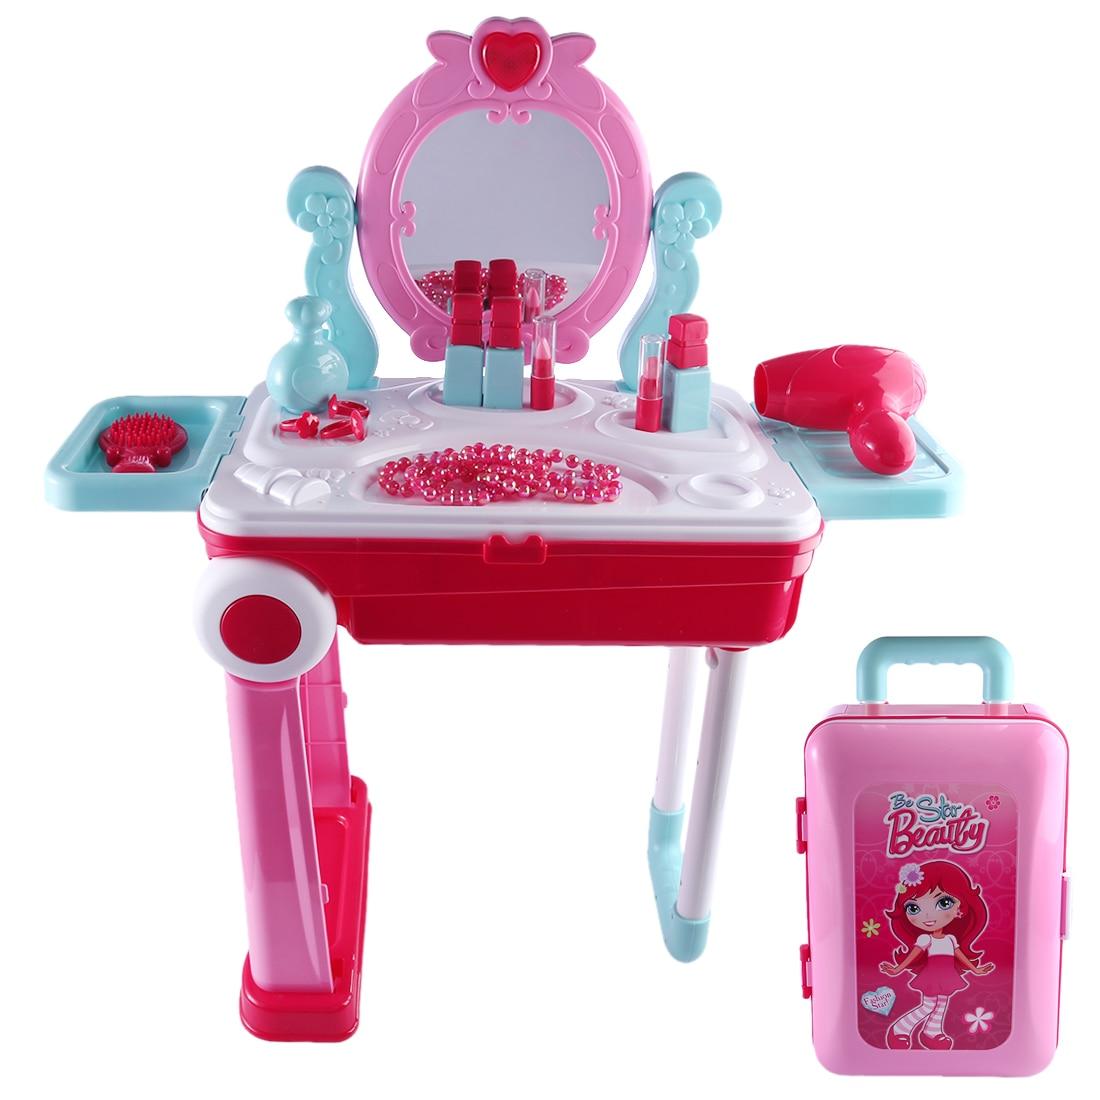 цены на NFSTRIKE Children pretend play Beauty Makeup Tool Sets Workbench Playset Educational Toys for girls Kids Early Development Toy  в интернет-магазинах